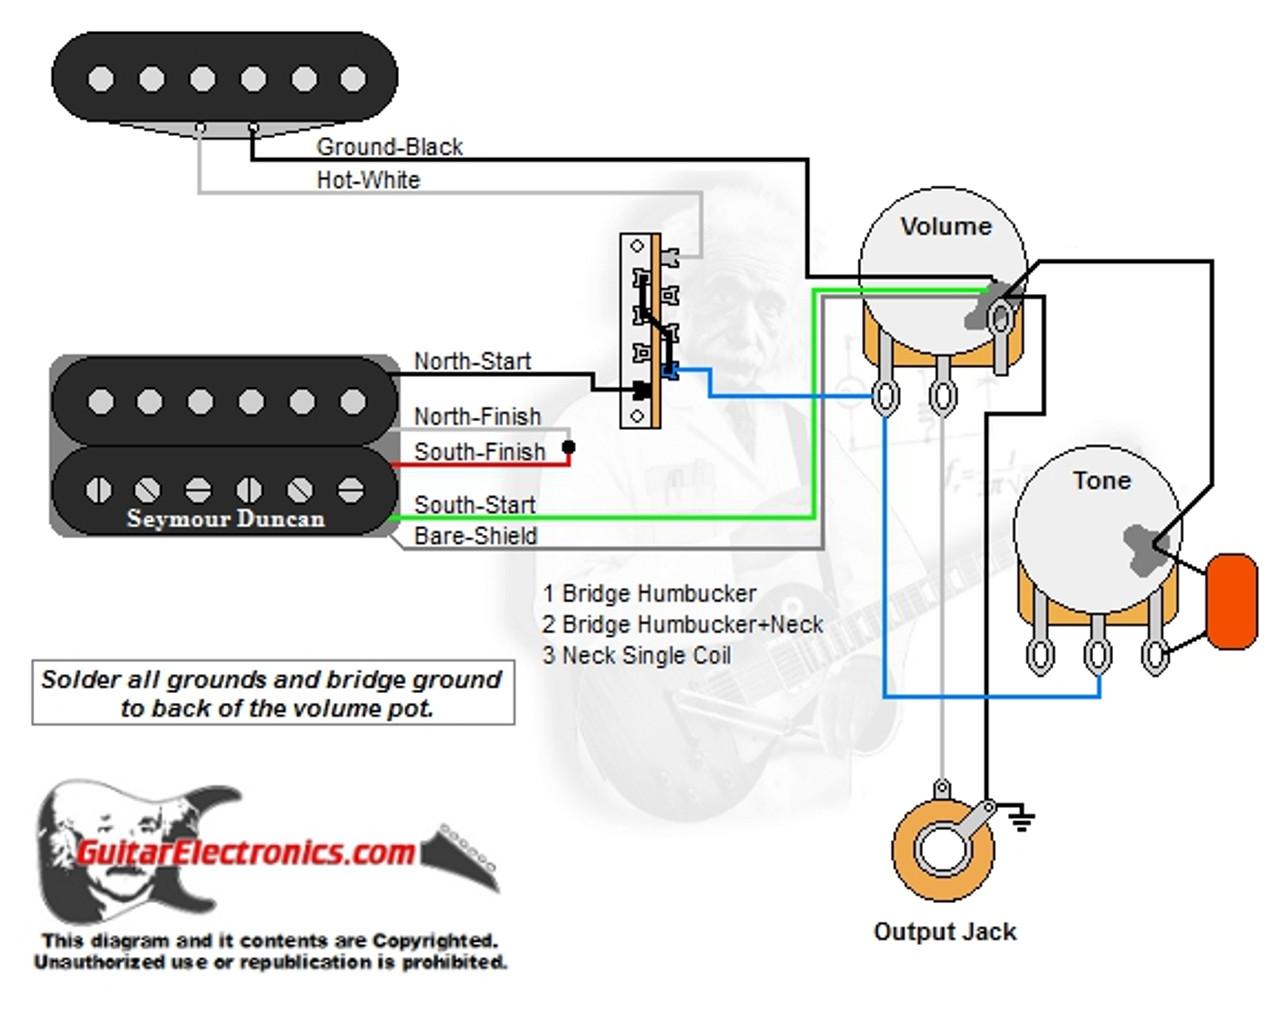 hight resolution of  diagramshumbucker wiring diagrams 1 humbucker 1 single coil 3 way lever switch 1 volume 1 tone 001 humbucker 1